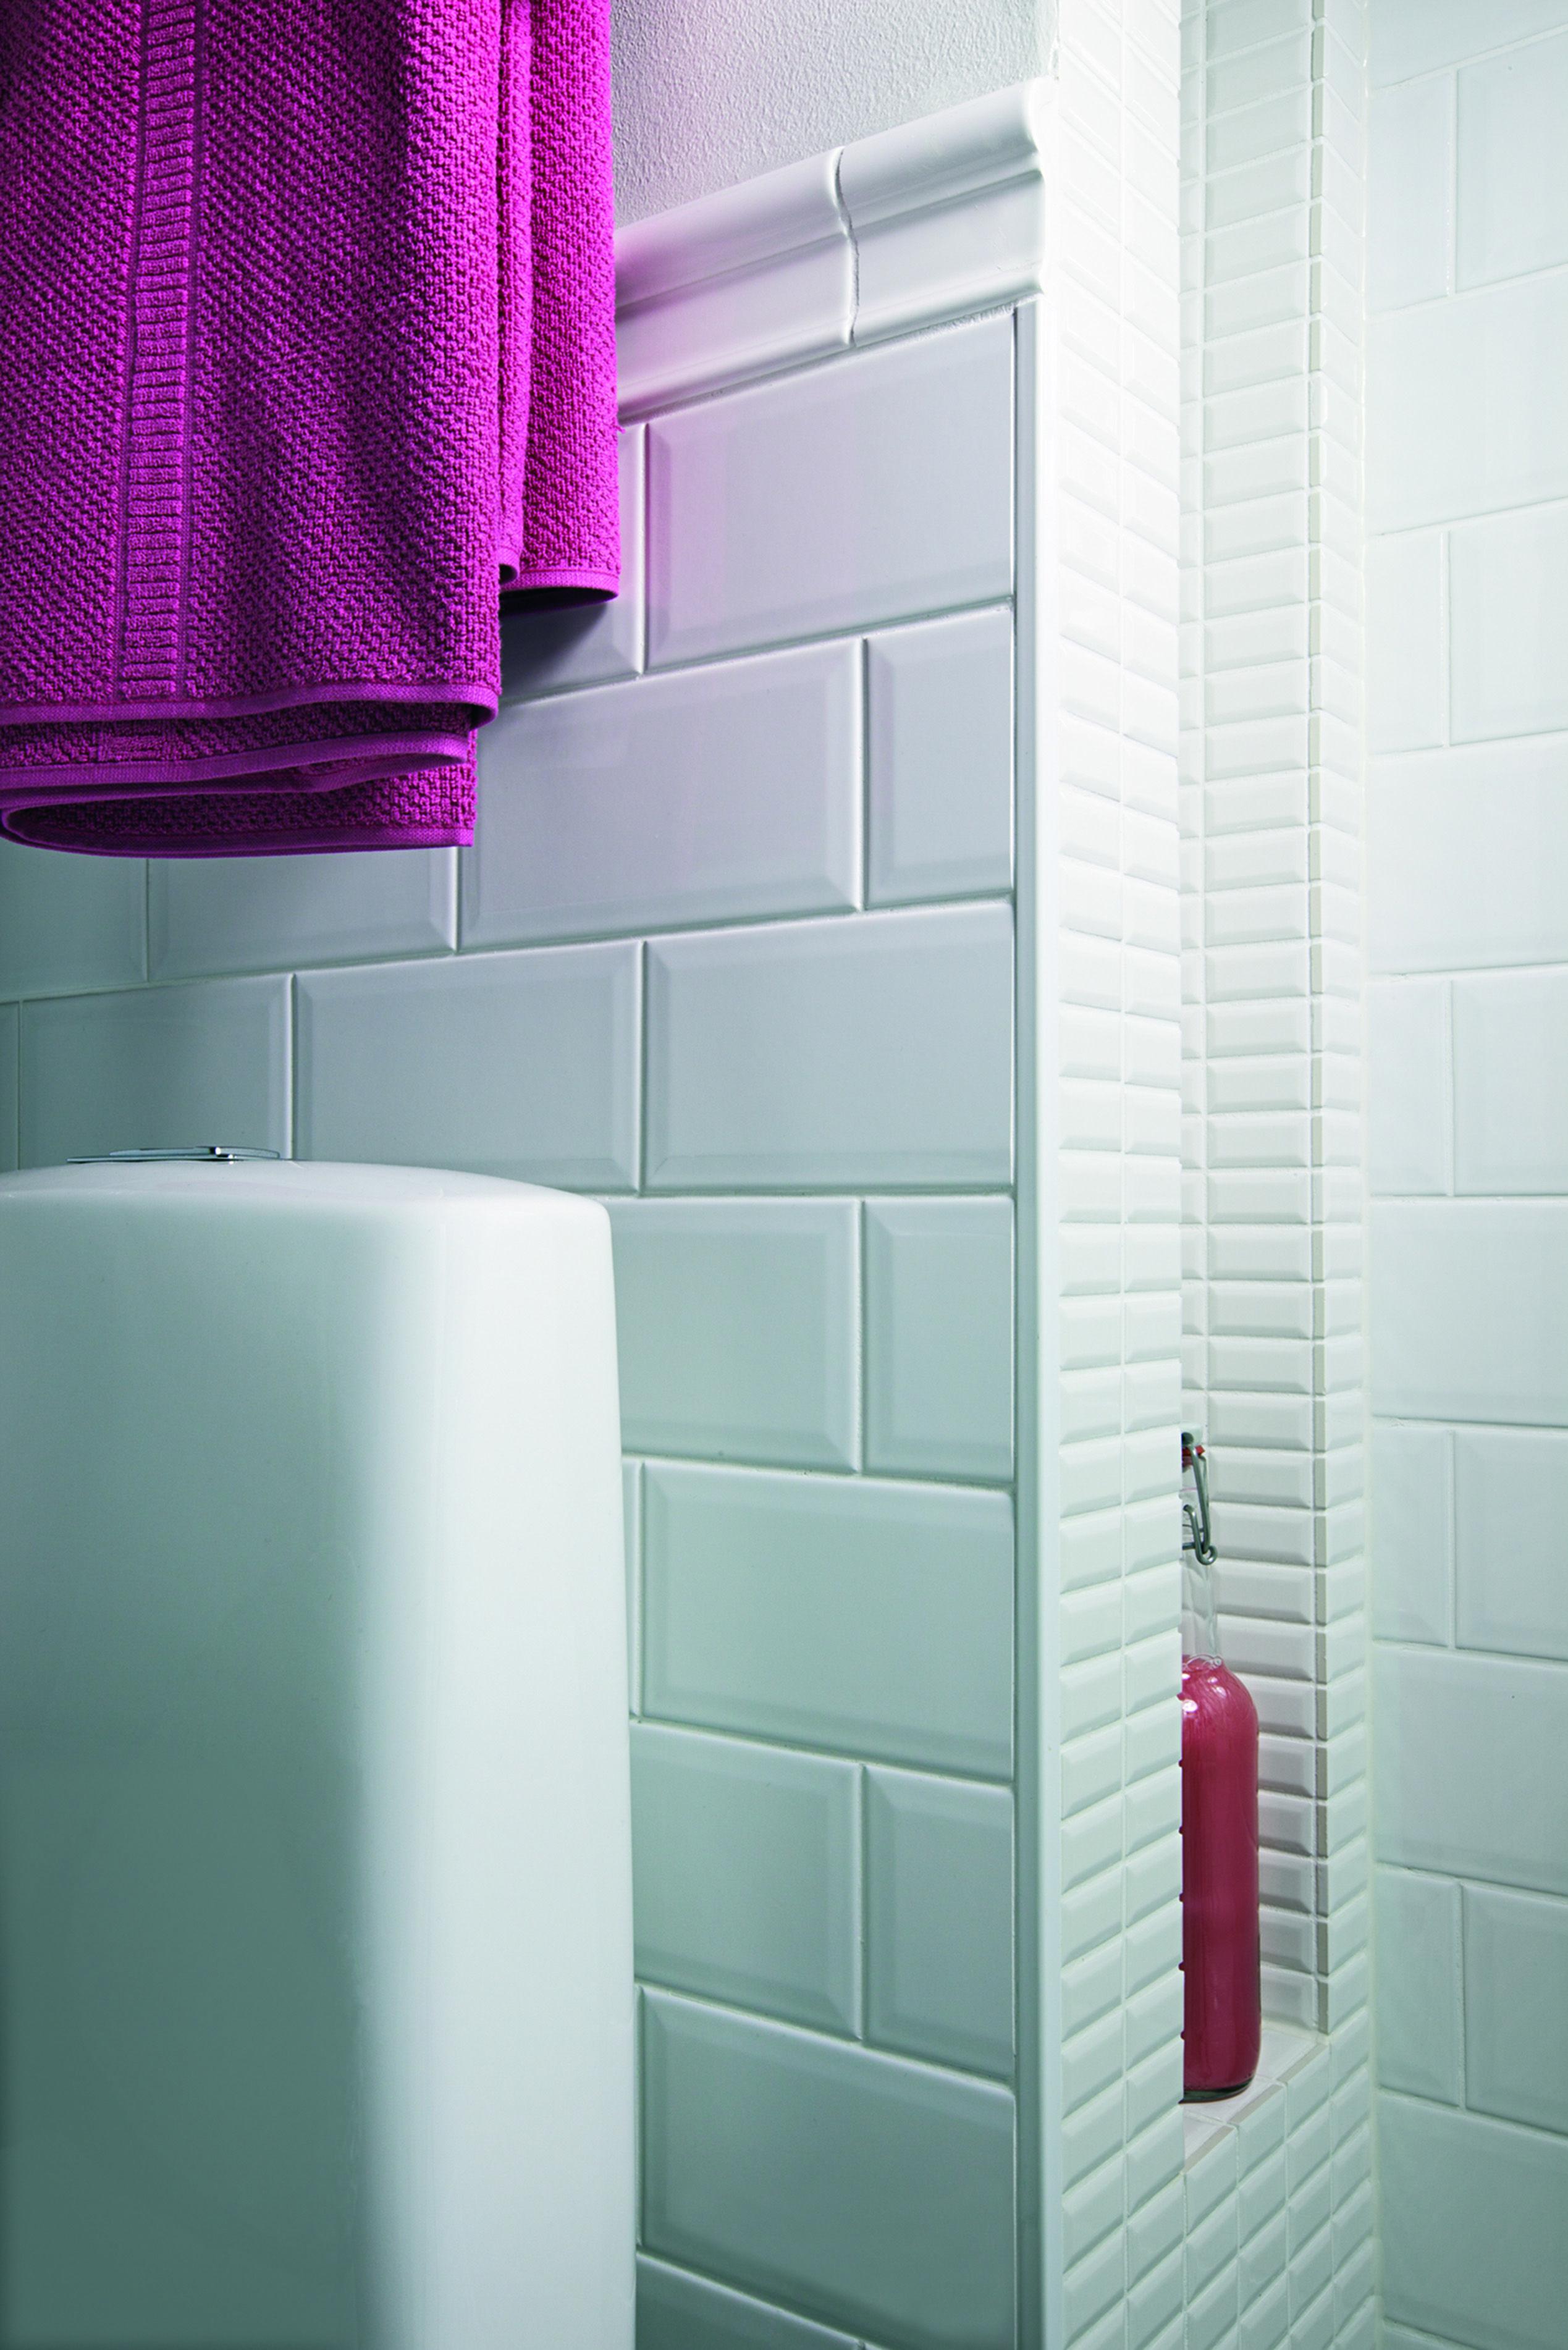 Laattalista, Alumiinia, V Ri Valkoinen Tile Trim, Aluminium, Colour White